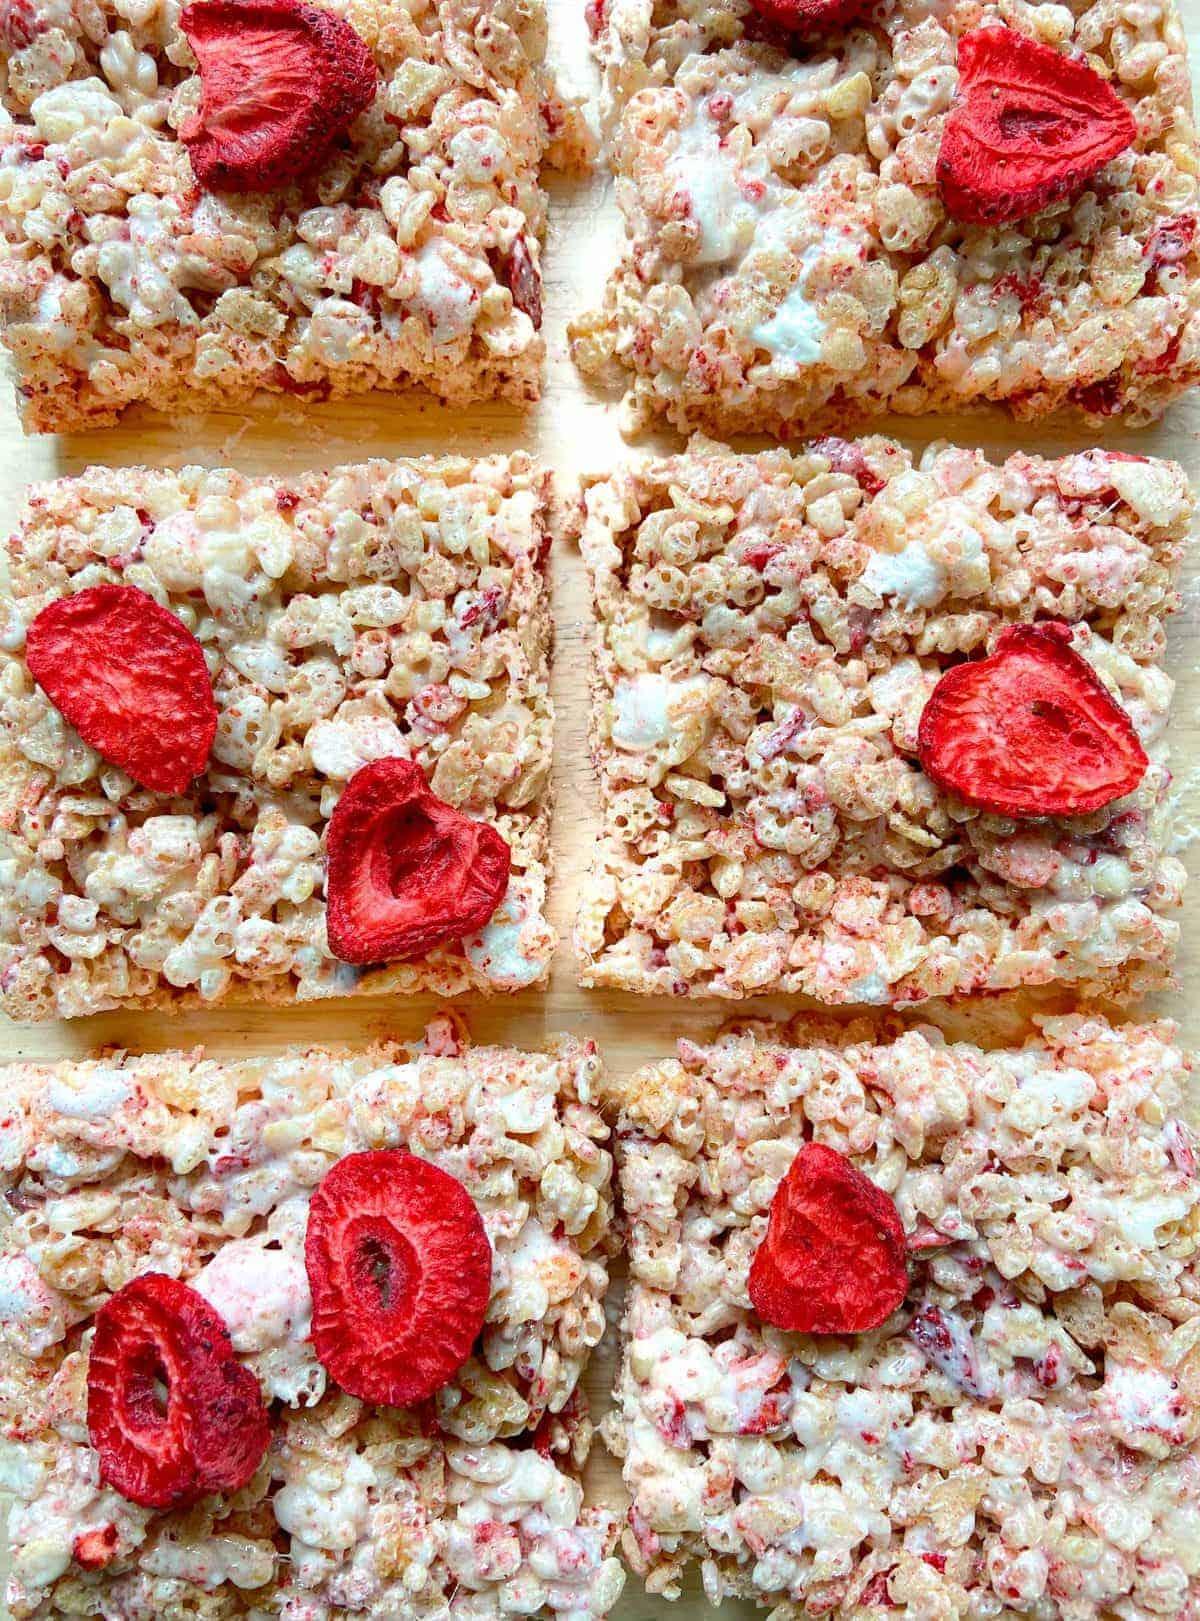 Strawberries and Cream Rice Krispie Treats